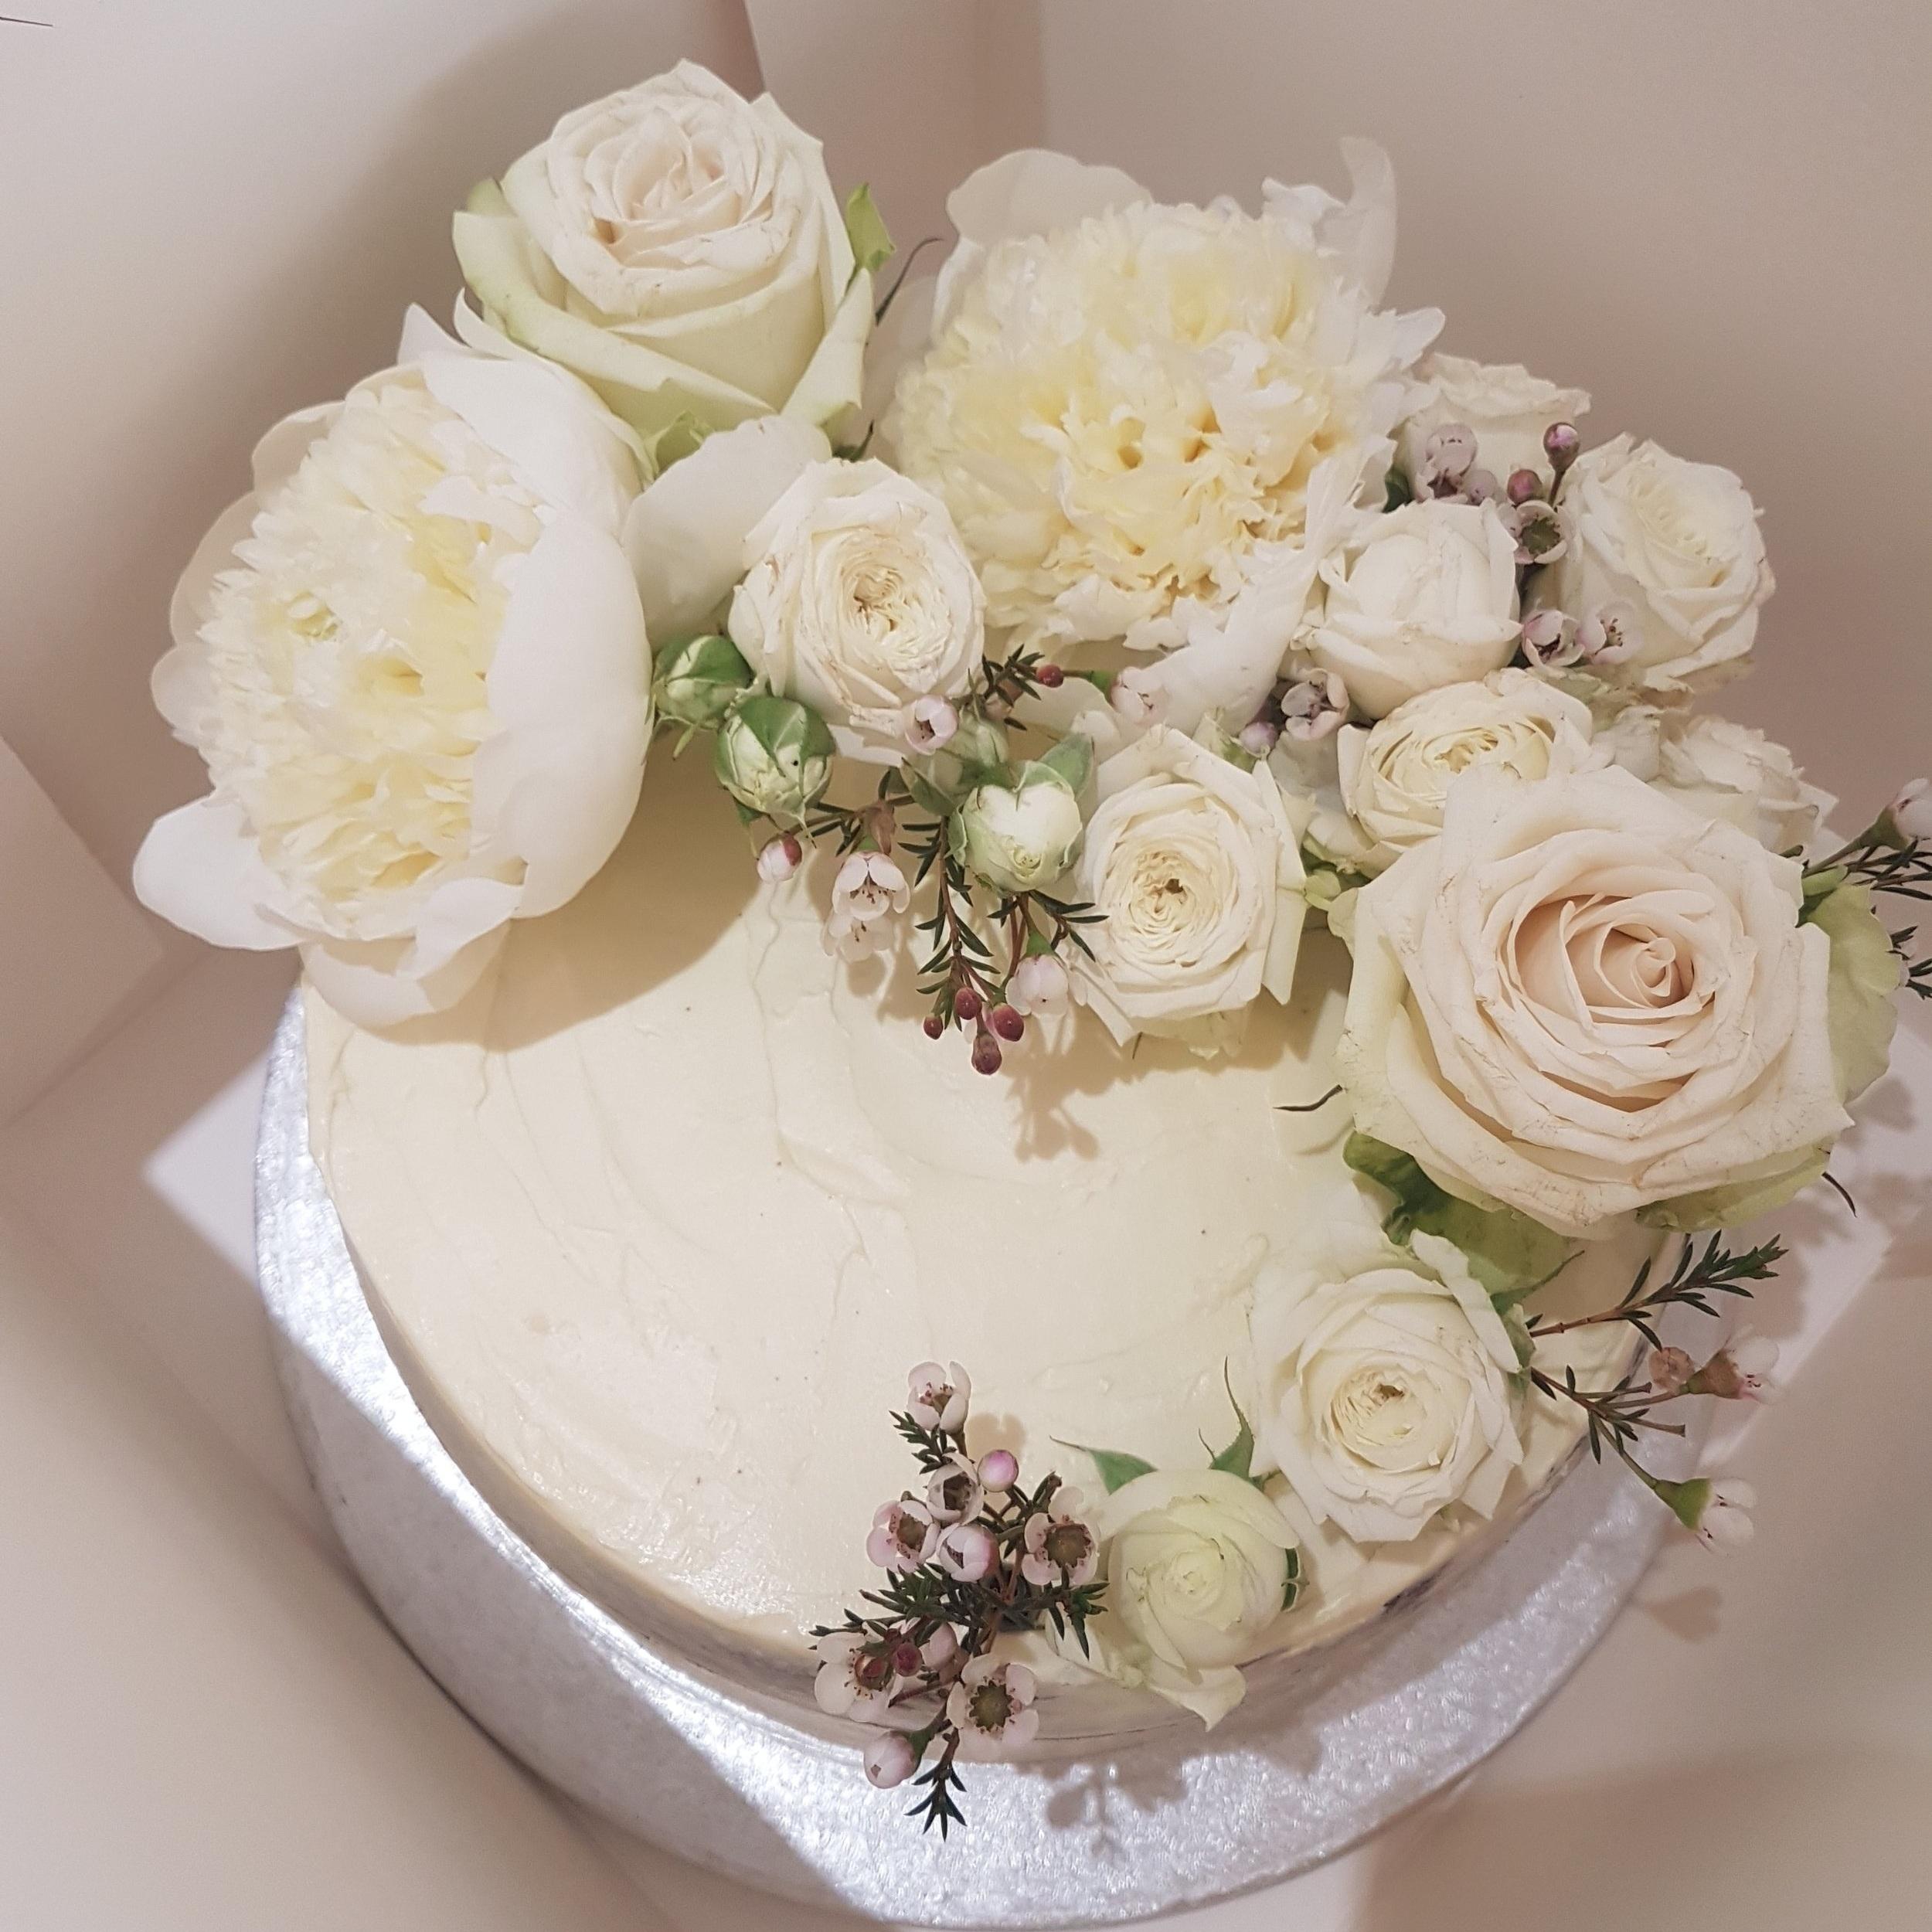 A summer garden inspired cake